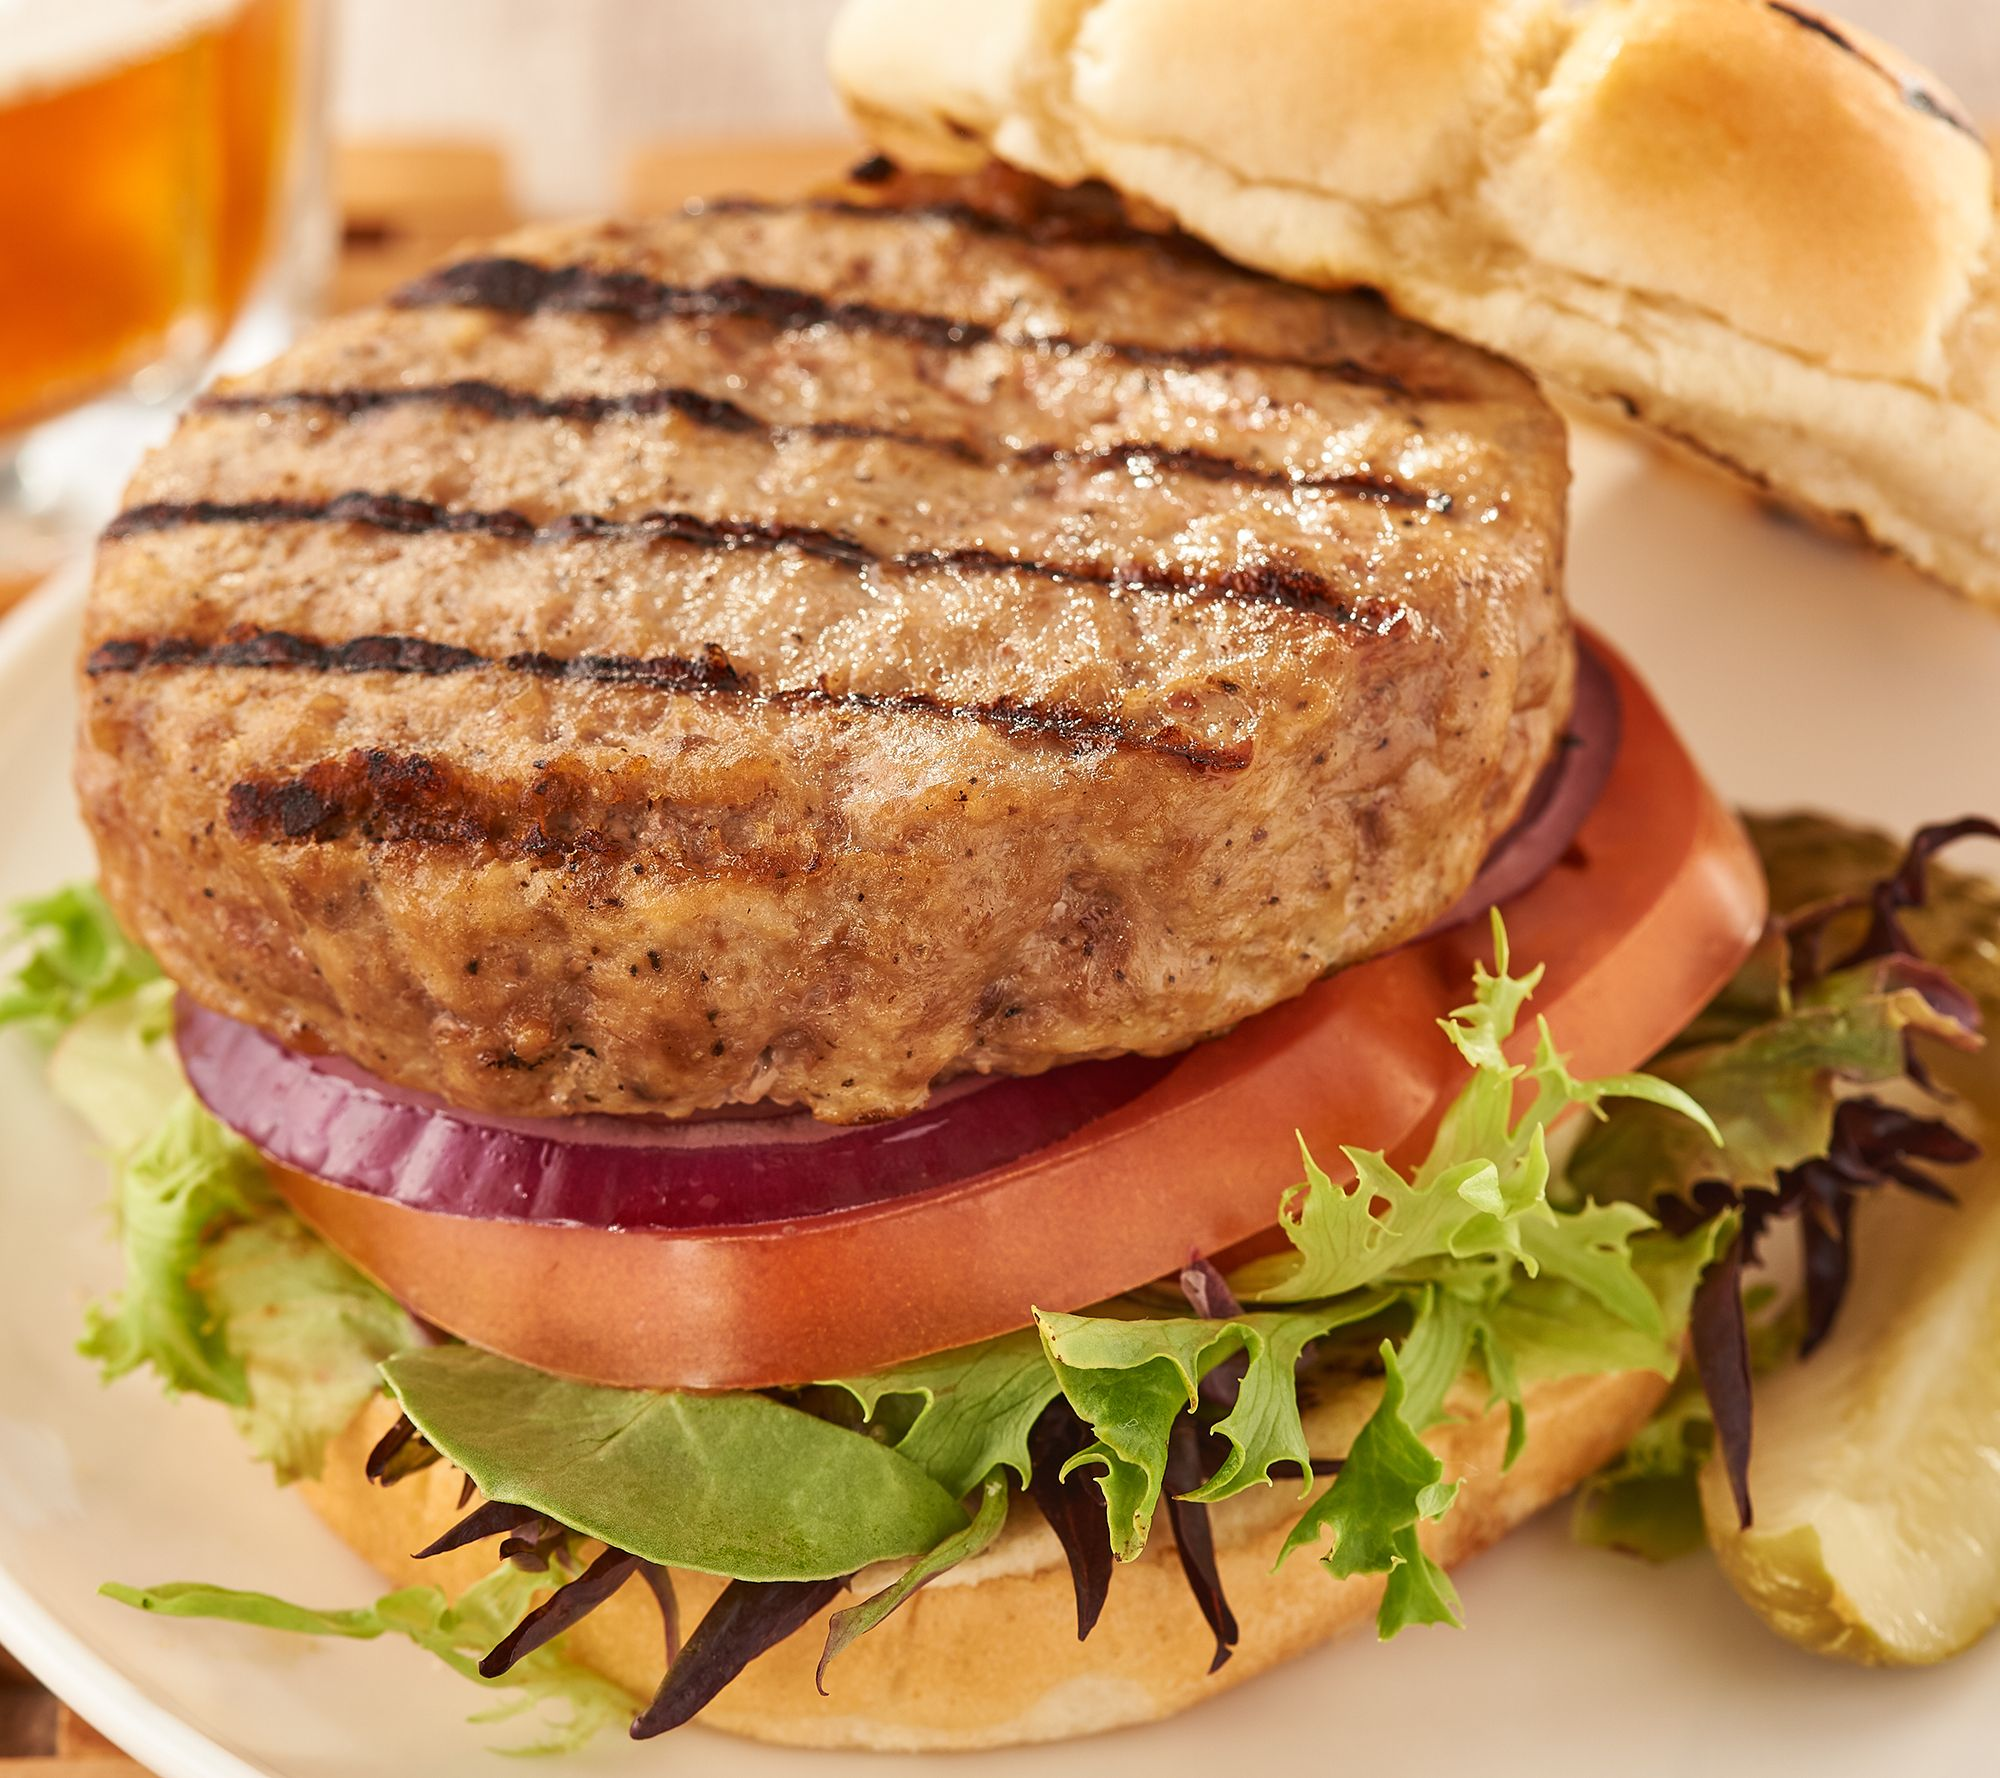 Red Top Farms 12 8 Oz Gourmet Berkshire Pork Patties Qvc Com